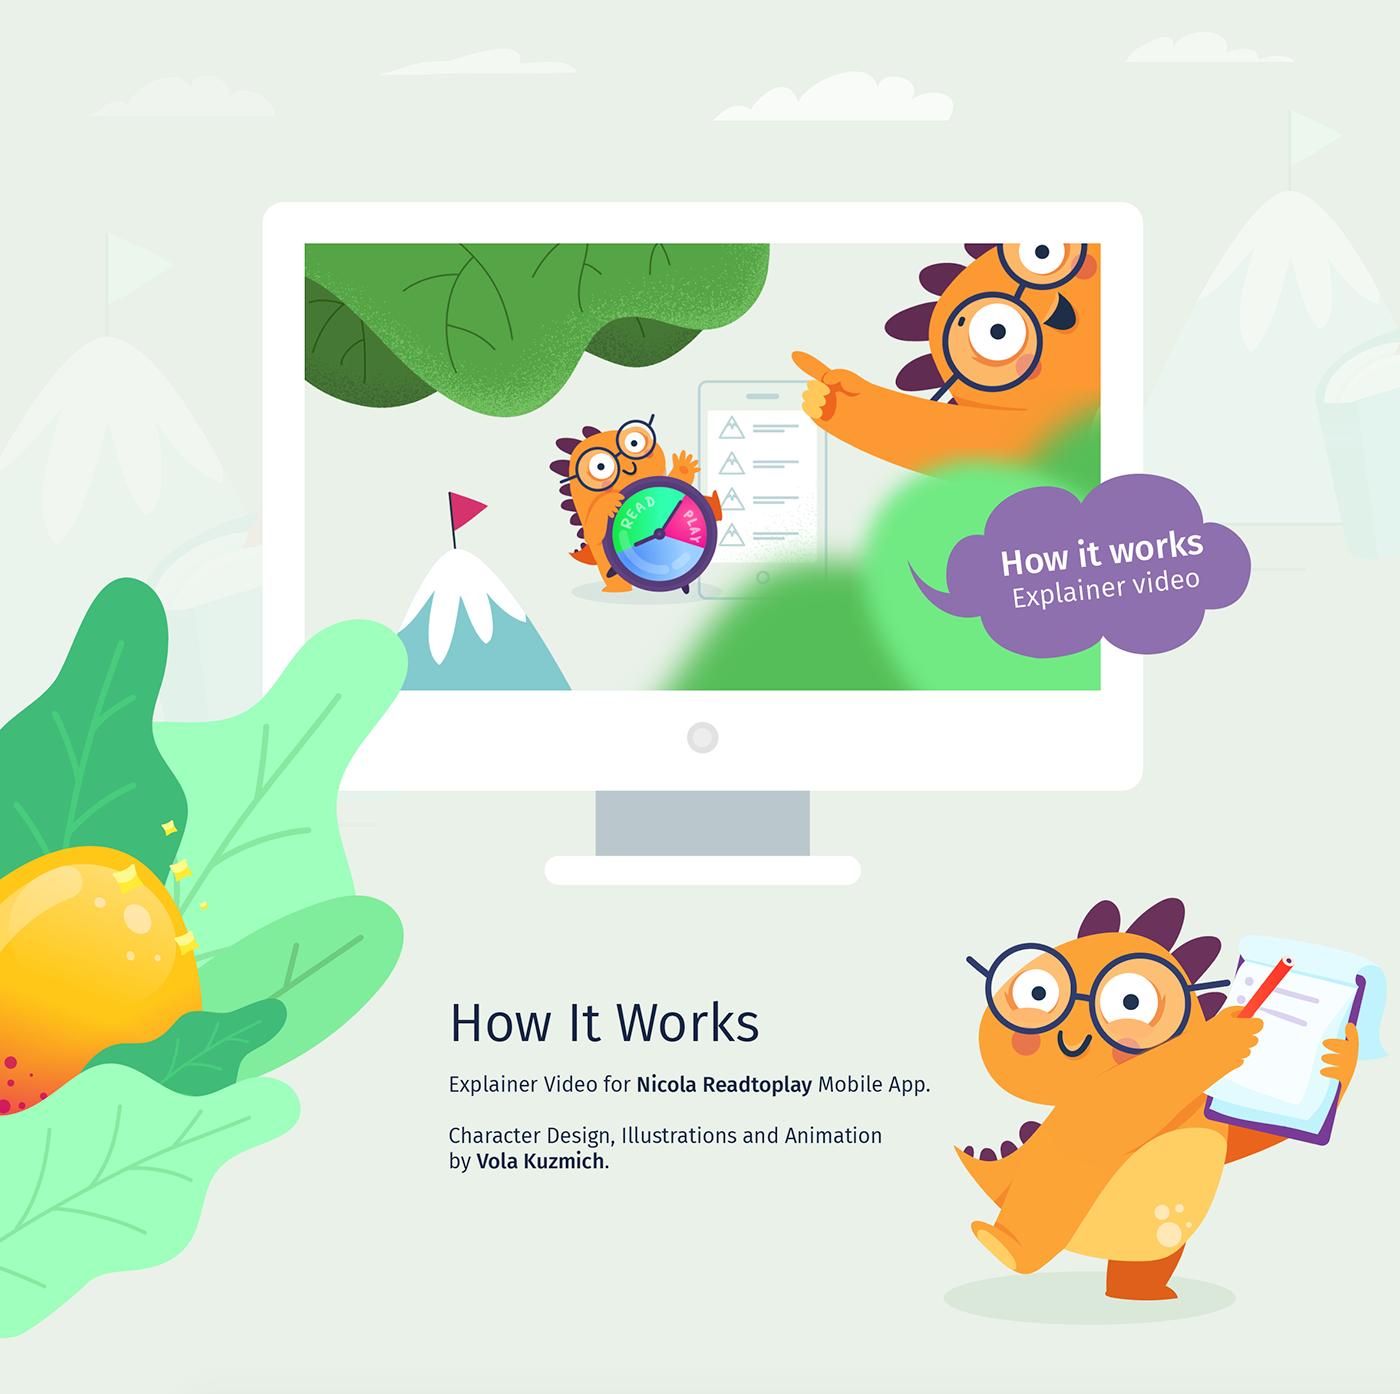 motion design animation  Dinosaur orange cute chatacter explainer video gif